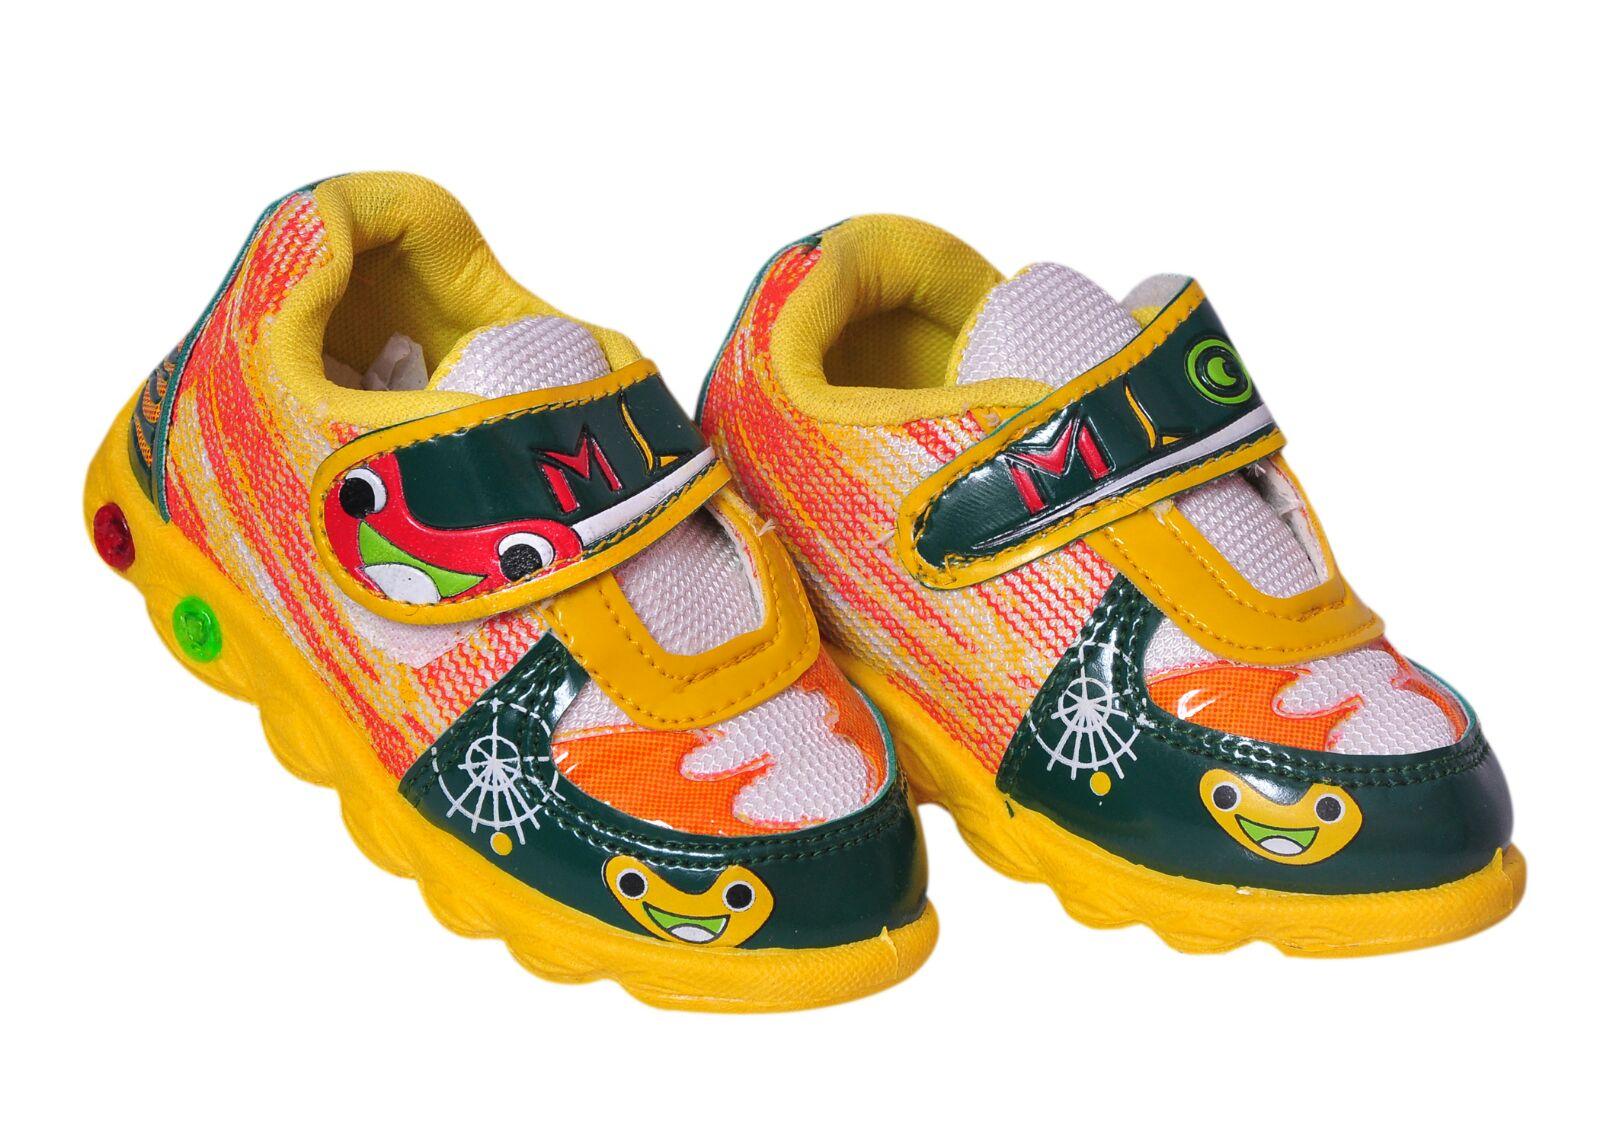 shoes with lights india 28 images adidas adizero light